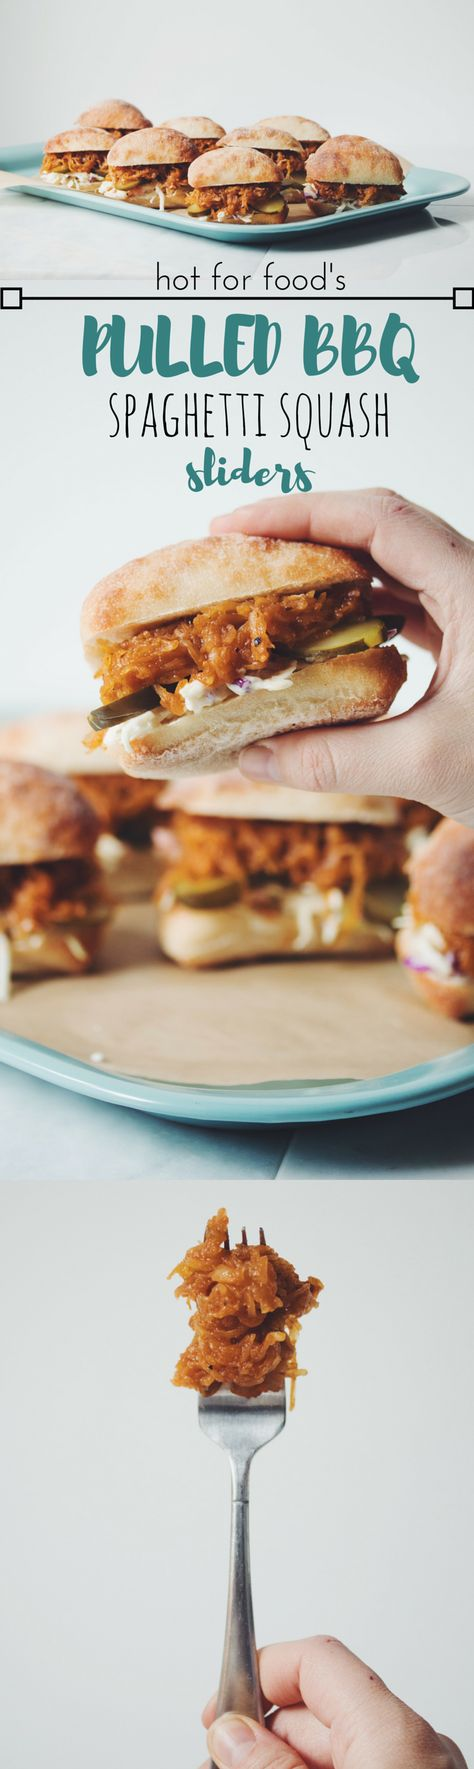 pulled BBQ spaghetti squash sliders | RECIPE on hotforfoodblog.com